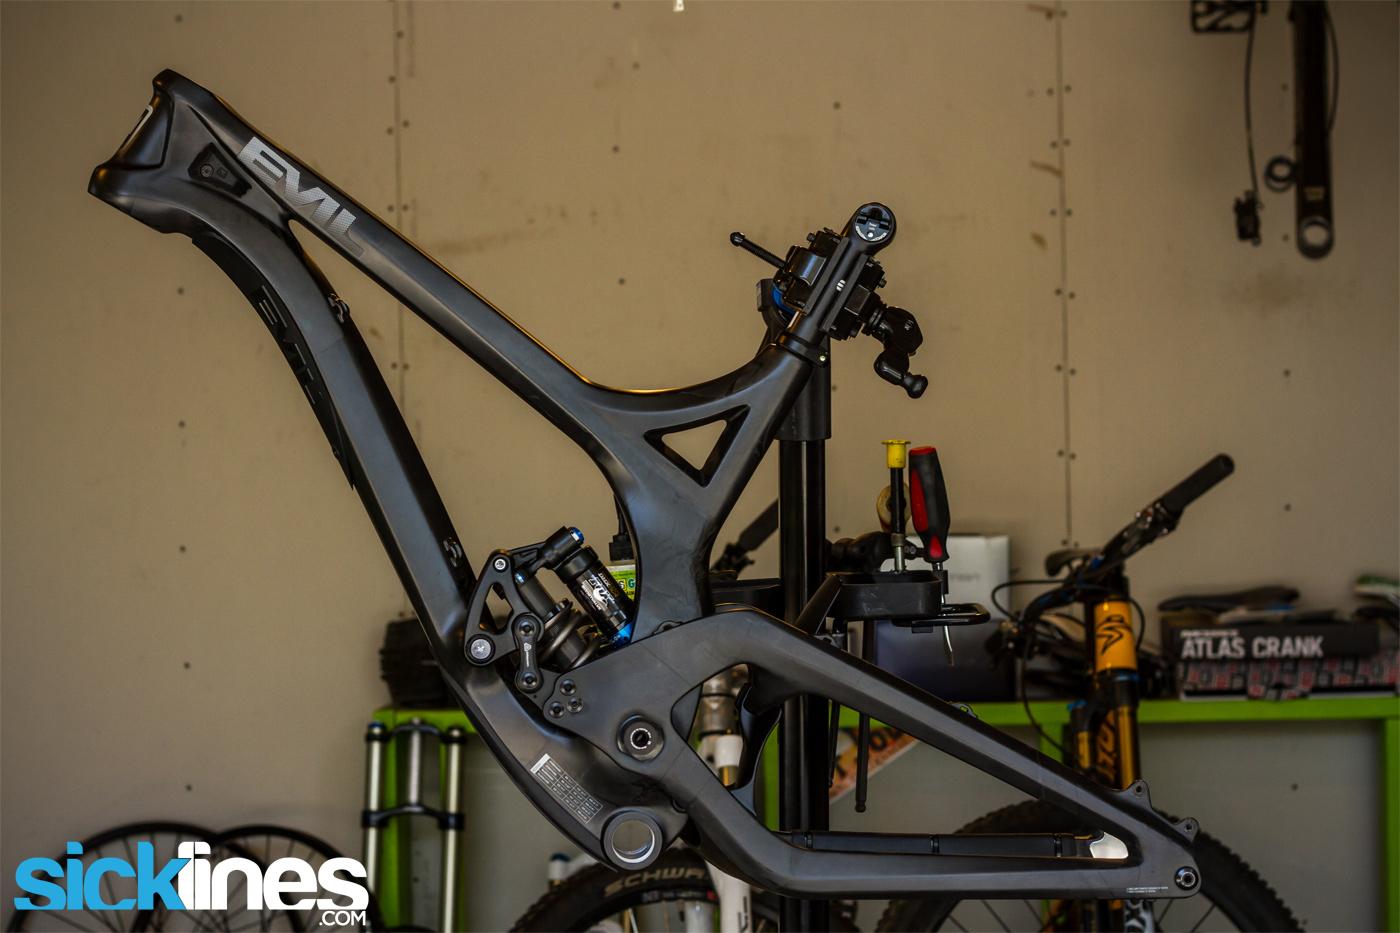 147d550cb45 2013 Evil Undead Frame Medium - Downhill Bike - Carbon Fiber - Sick ...